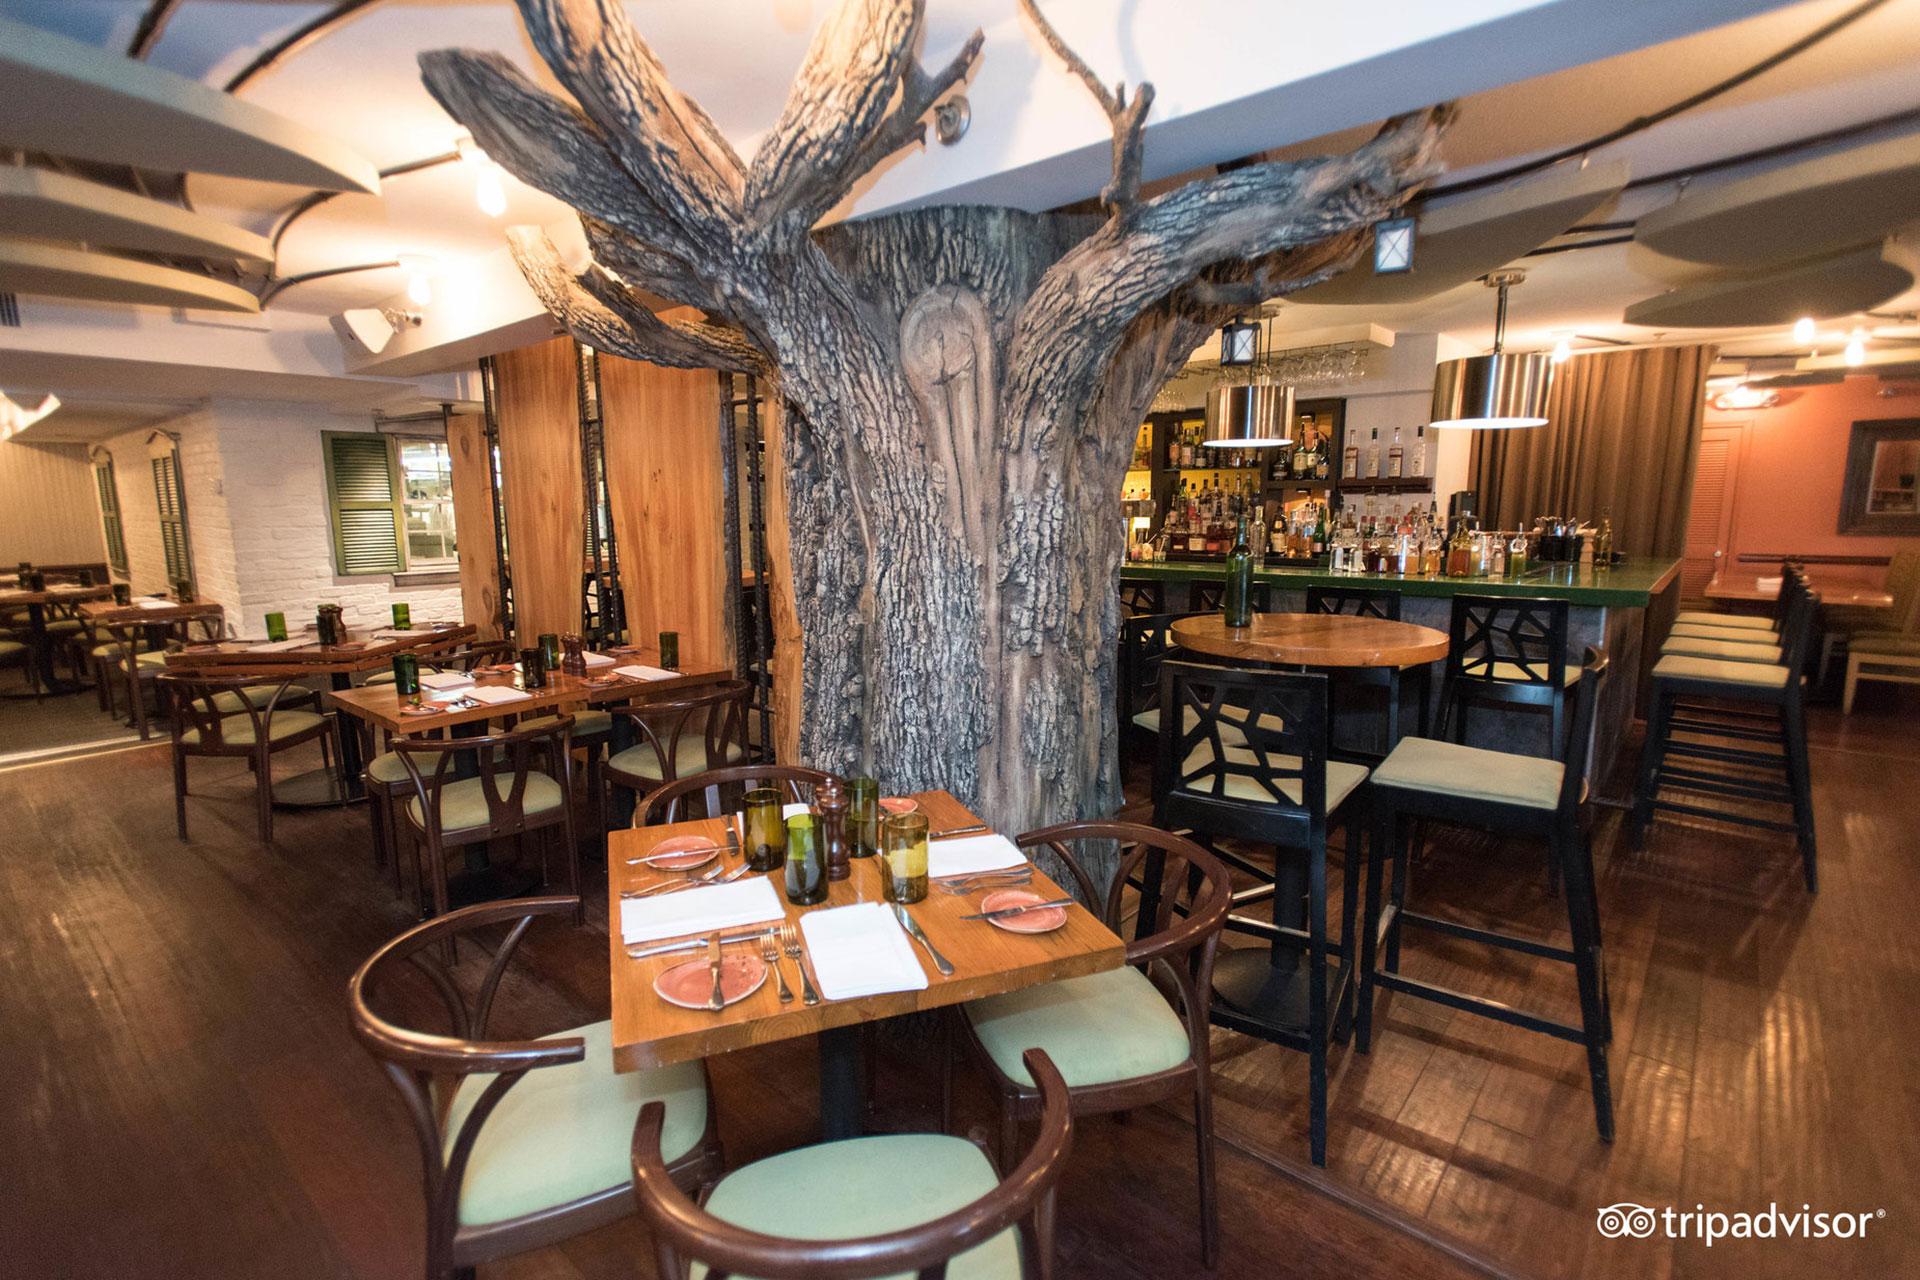 Firefly Restaurant in Washington D.C.